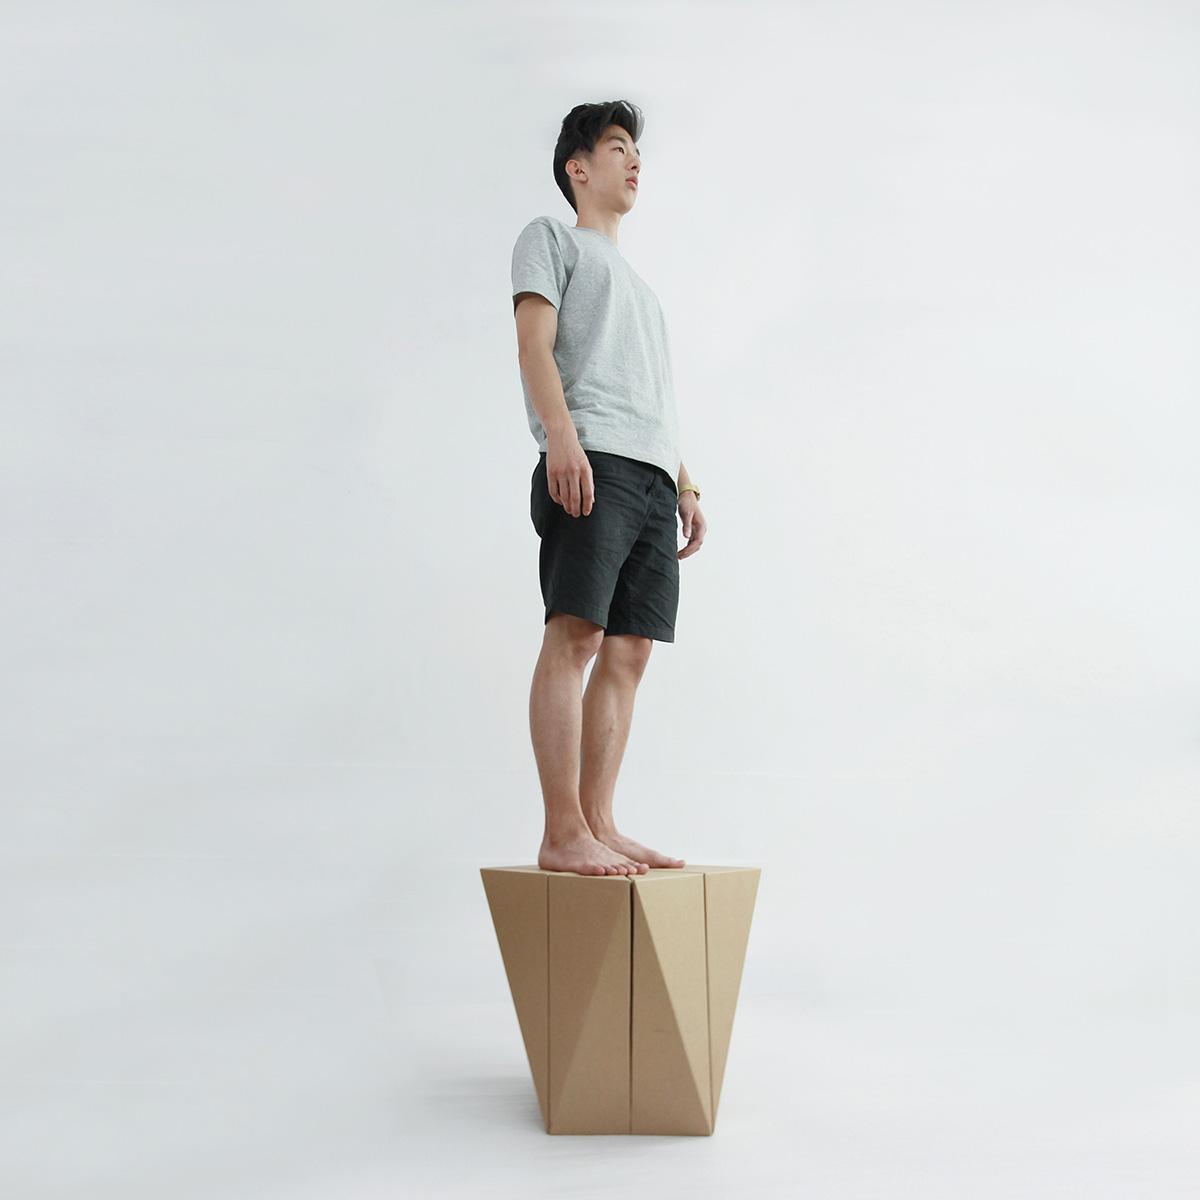 02-spiral-stool-misosoupdesign